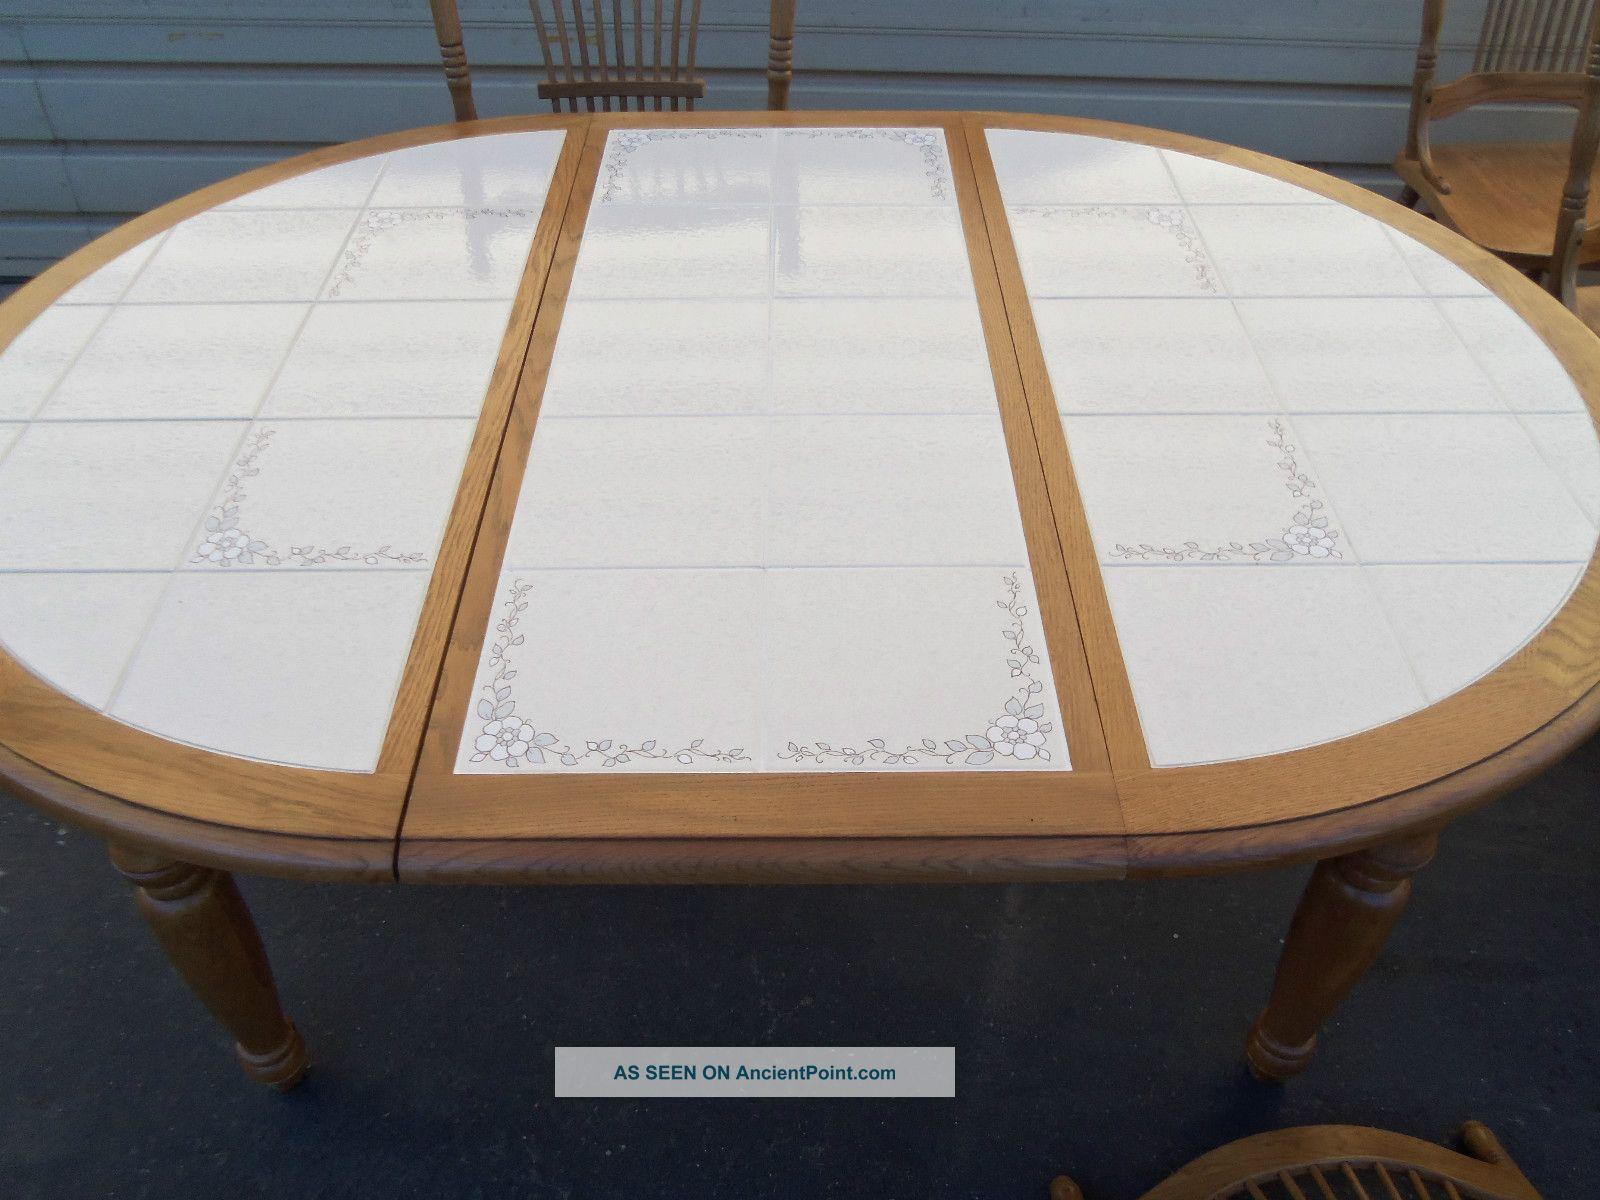 Oak For Table Top mpfmpfcom Almirah Beds Wardrobes  : 49493oaktiletopdiningtablewith6solidoakchairs8lgw from mpfmpf.com size 1600 x 1200 jpeg 213kB